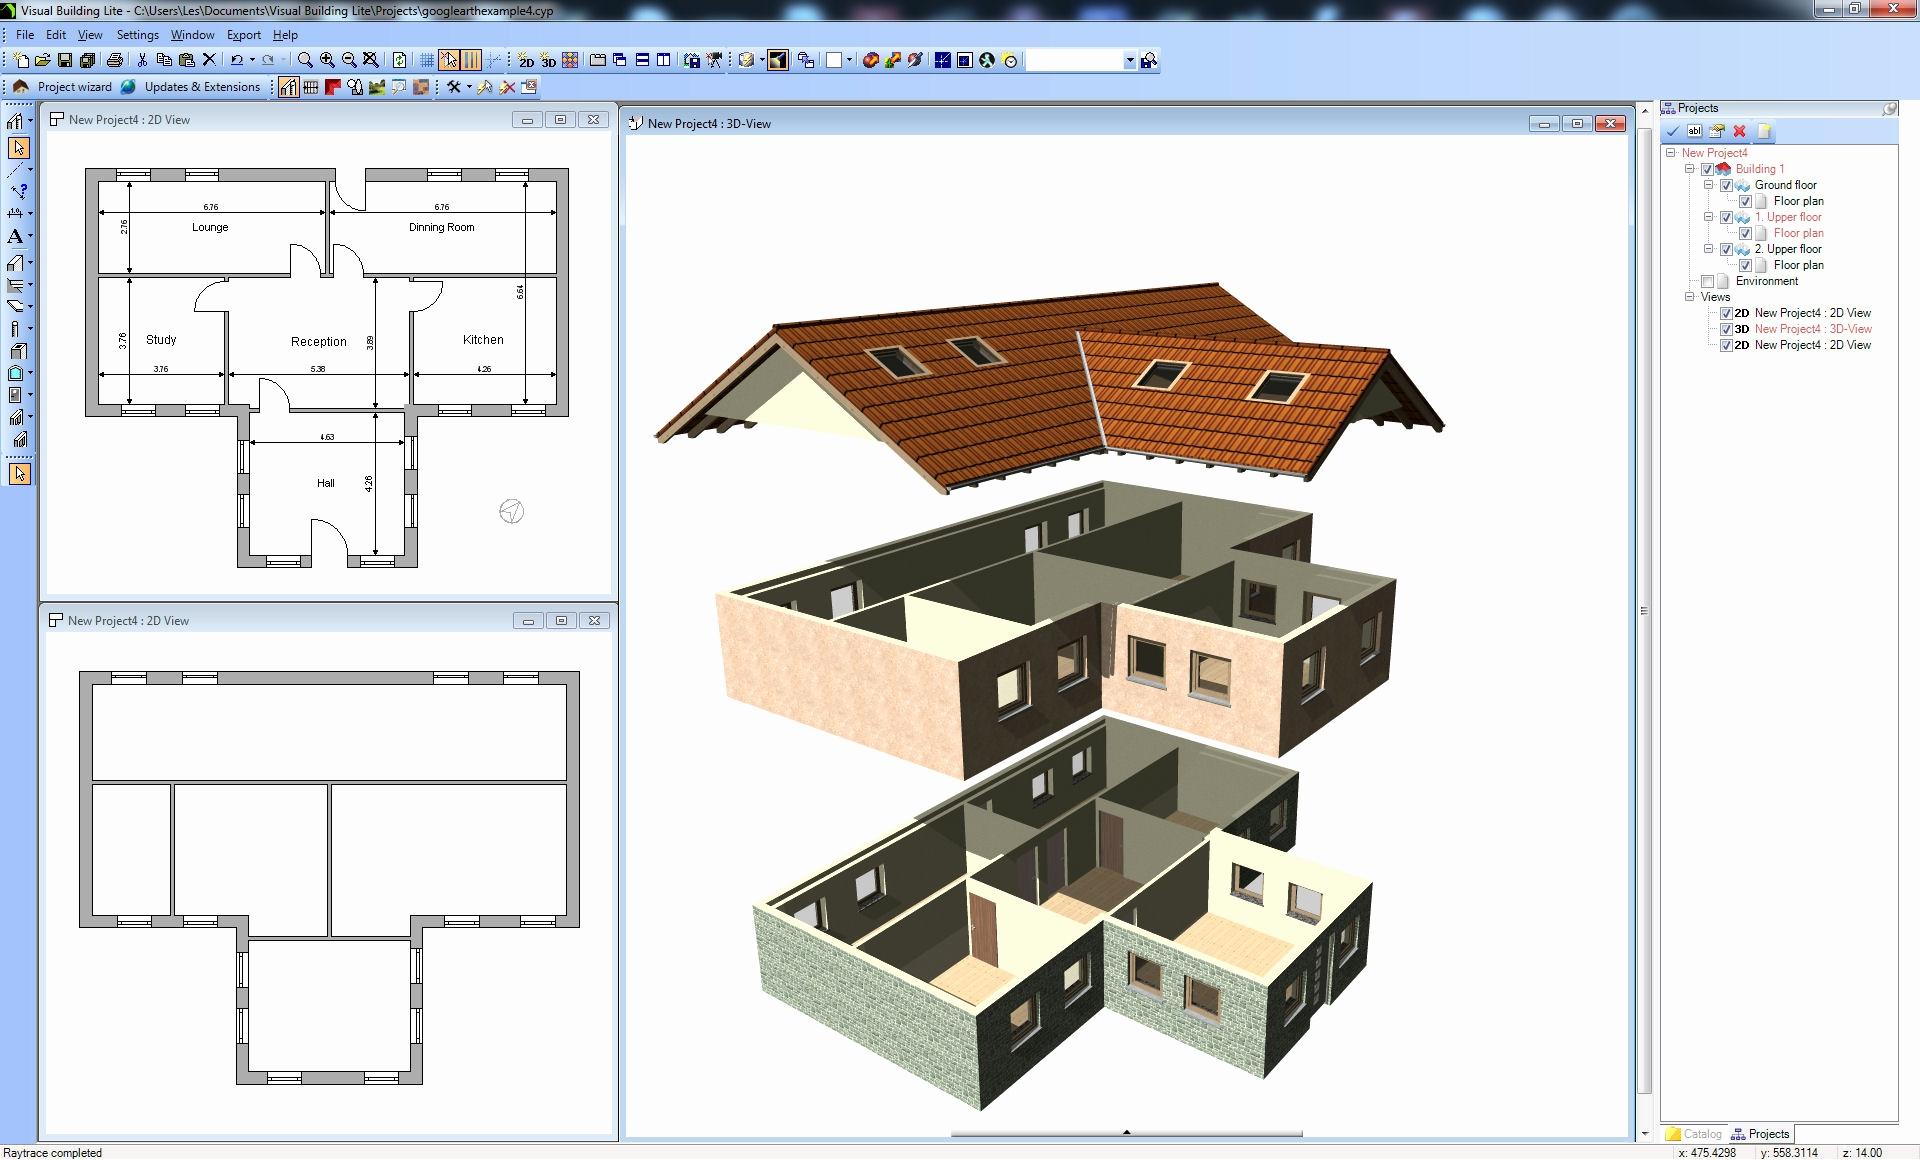 1920x1160 Open Source Room Layout Software Unique House Plan Architecture